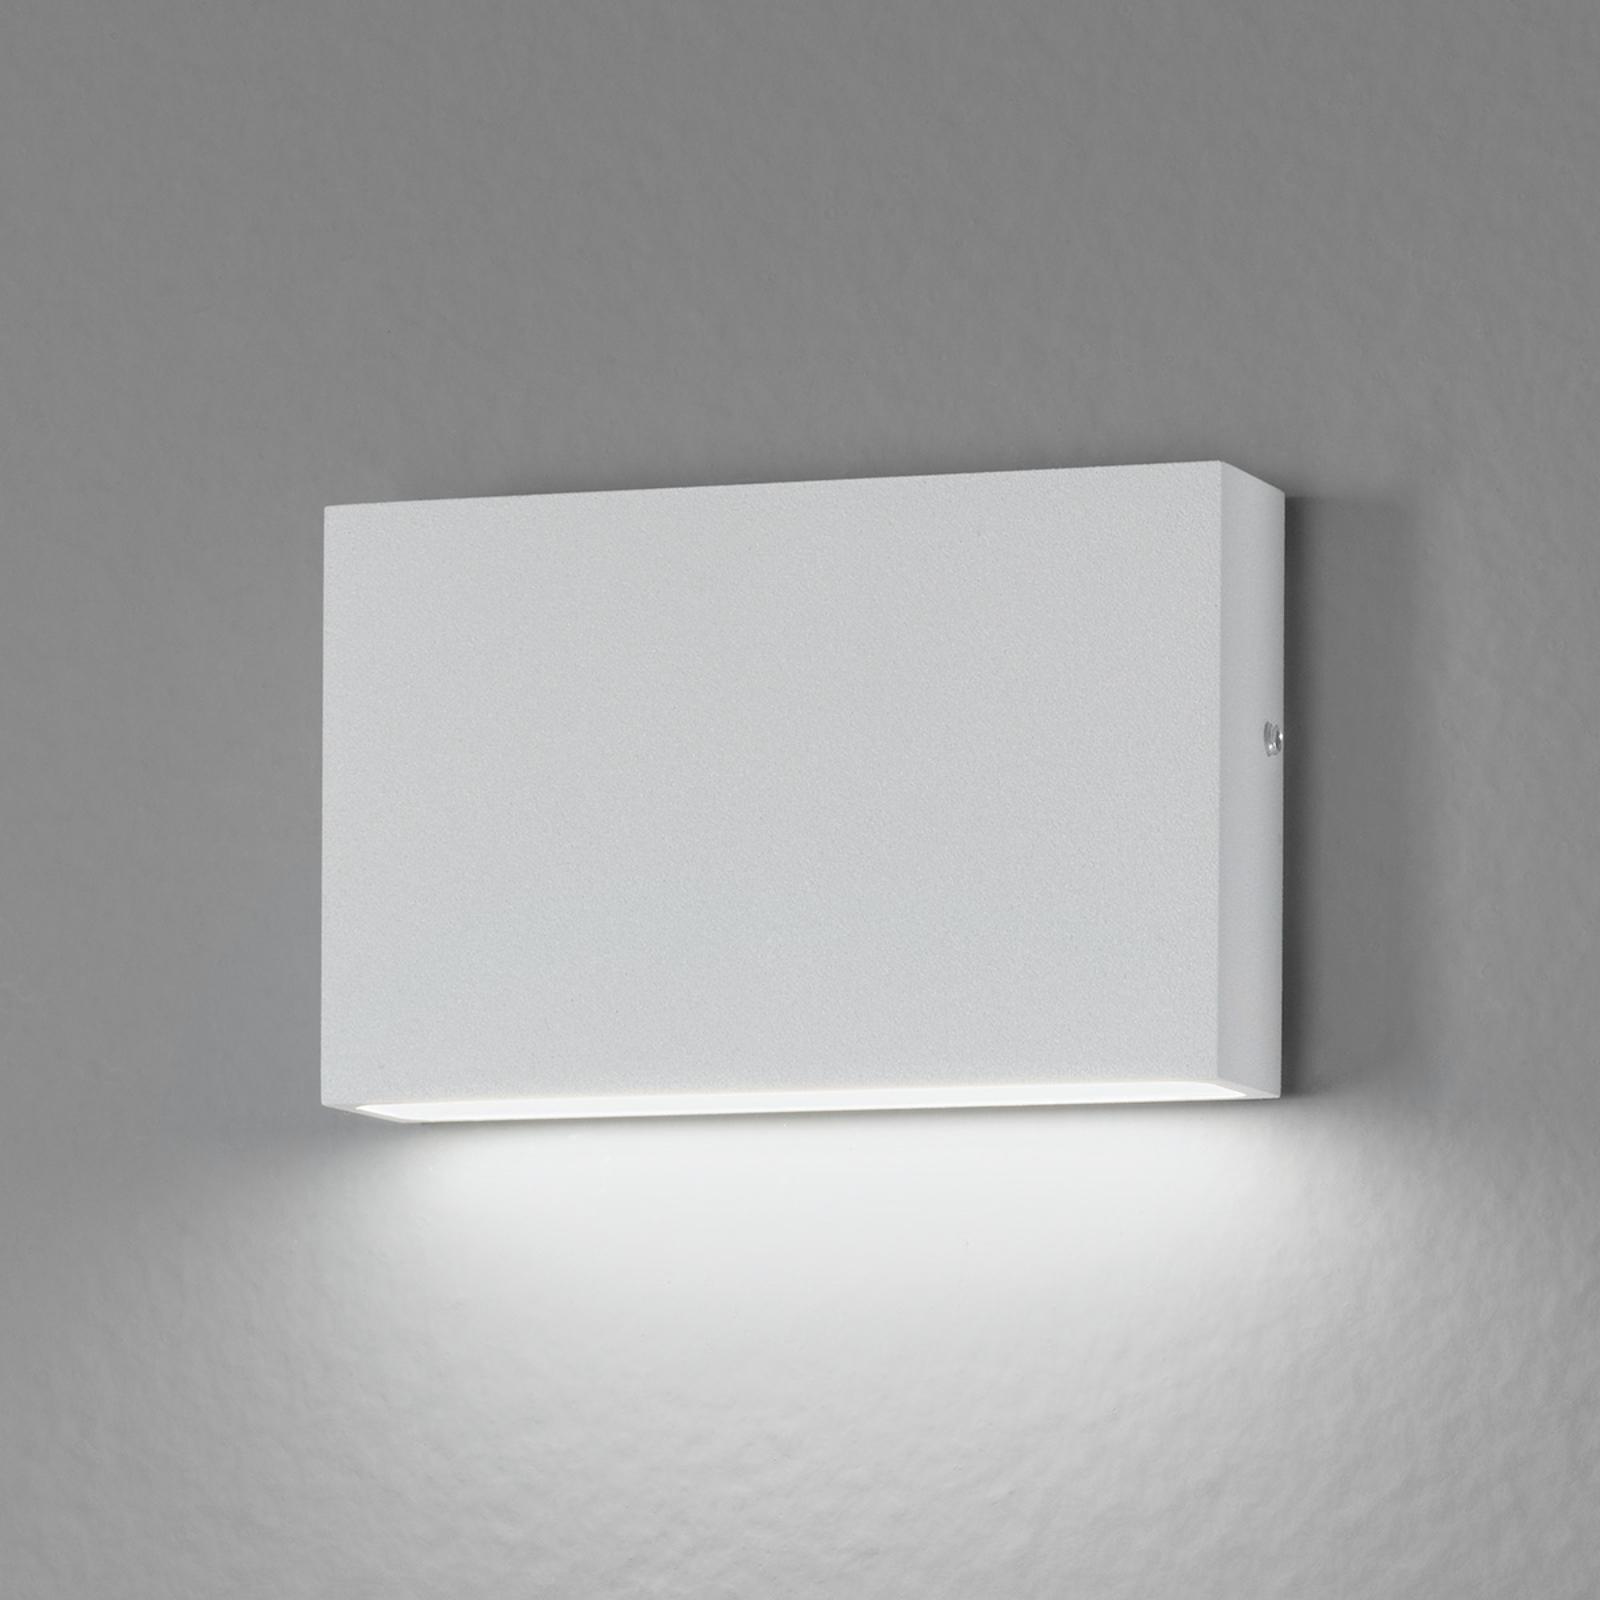 Pre interiér a exteriér – nástenné LED Flatbox_3023094_1